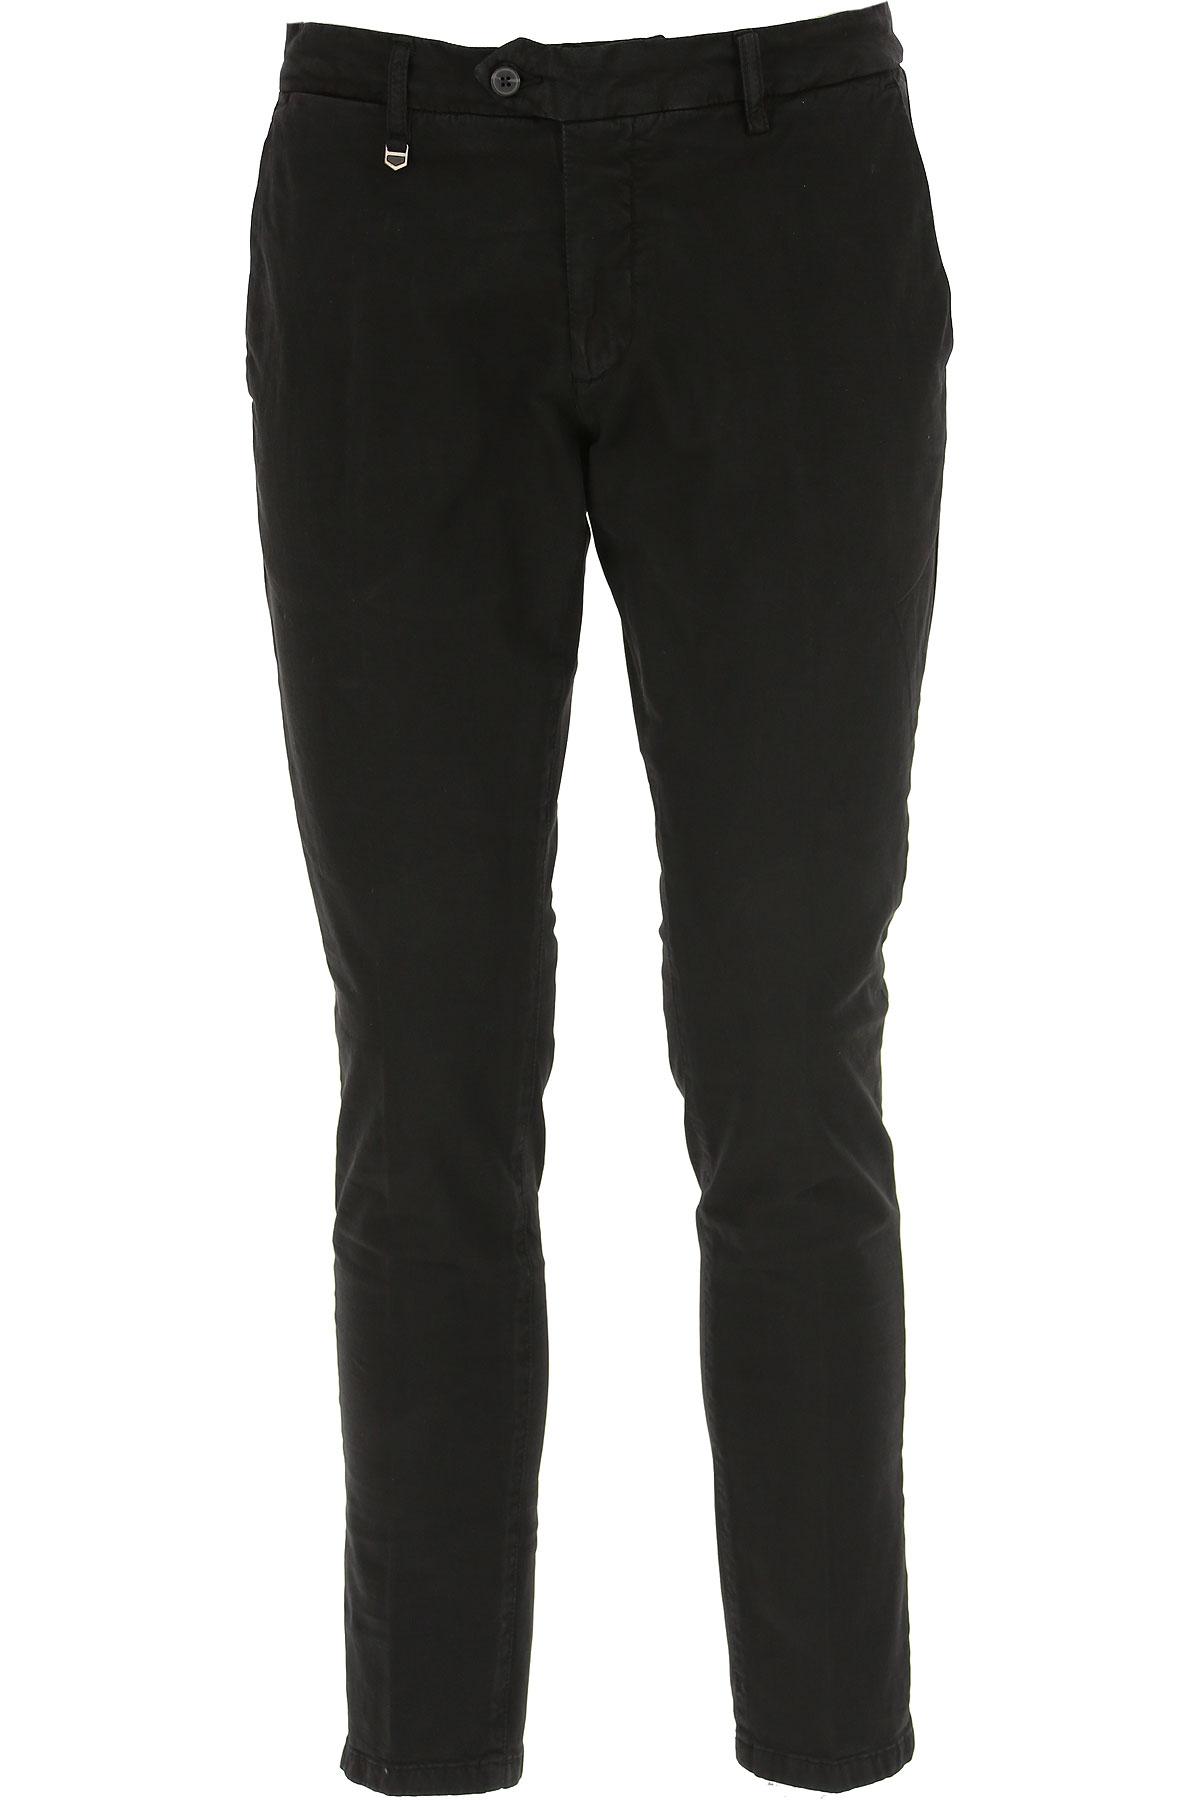 Antony Morato Pants for Men On Sale, Black, Cotton, 2019, 32 34 36